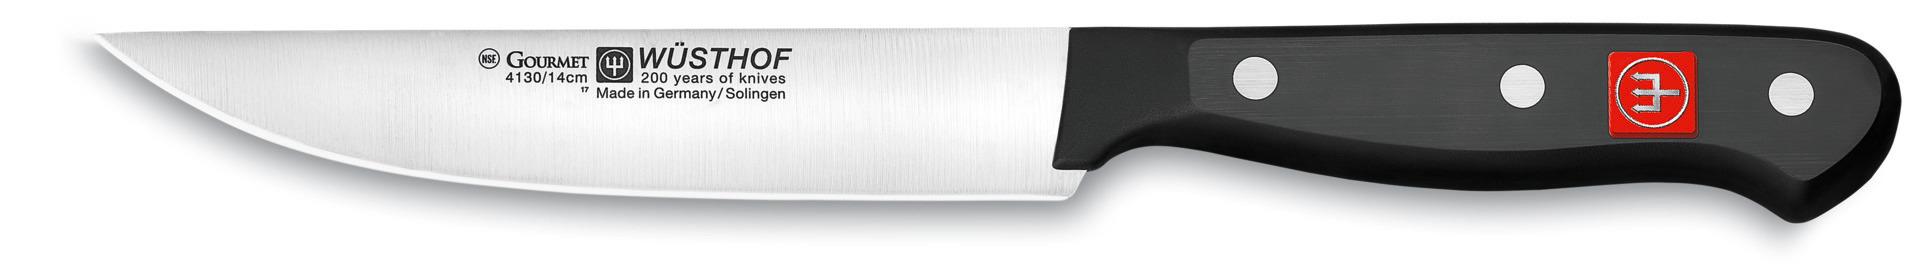 Küchenmesser Klingenlänge 160 mm / 281 mm lang